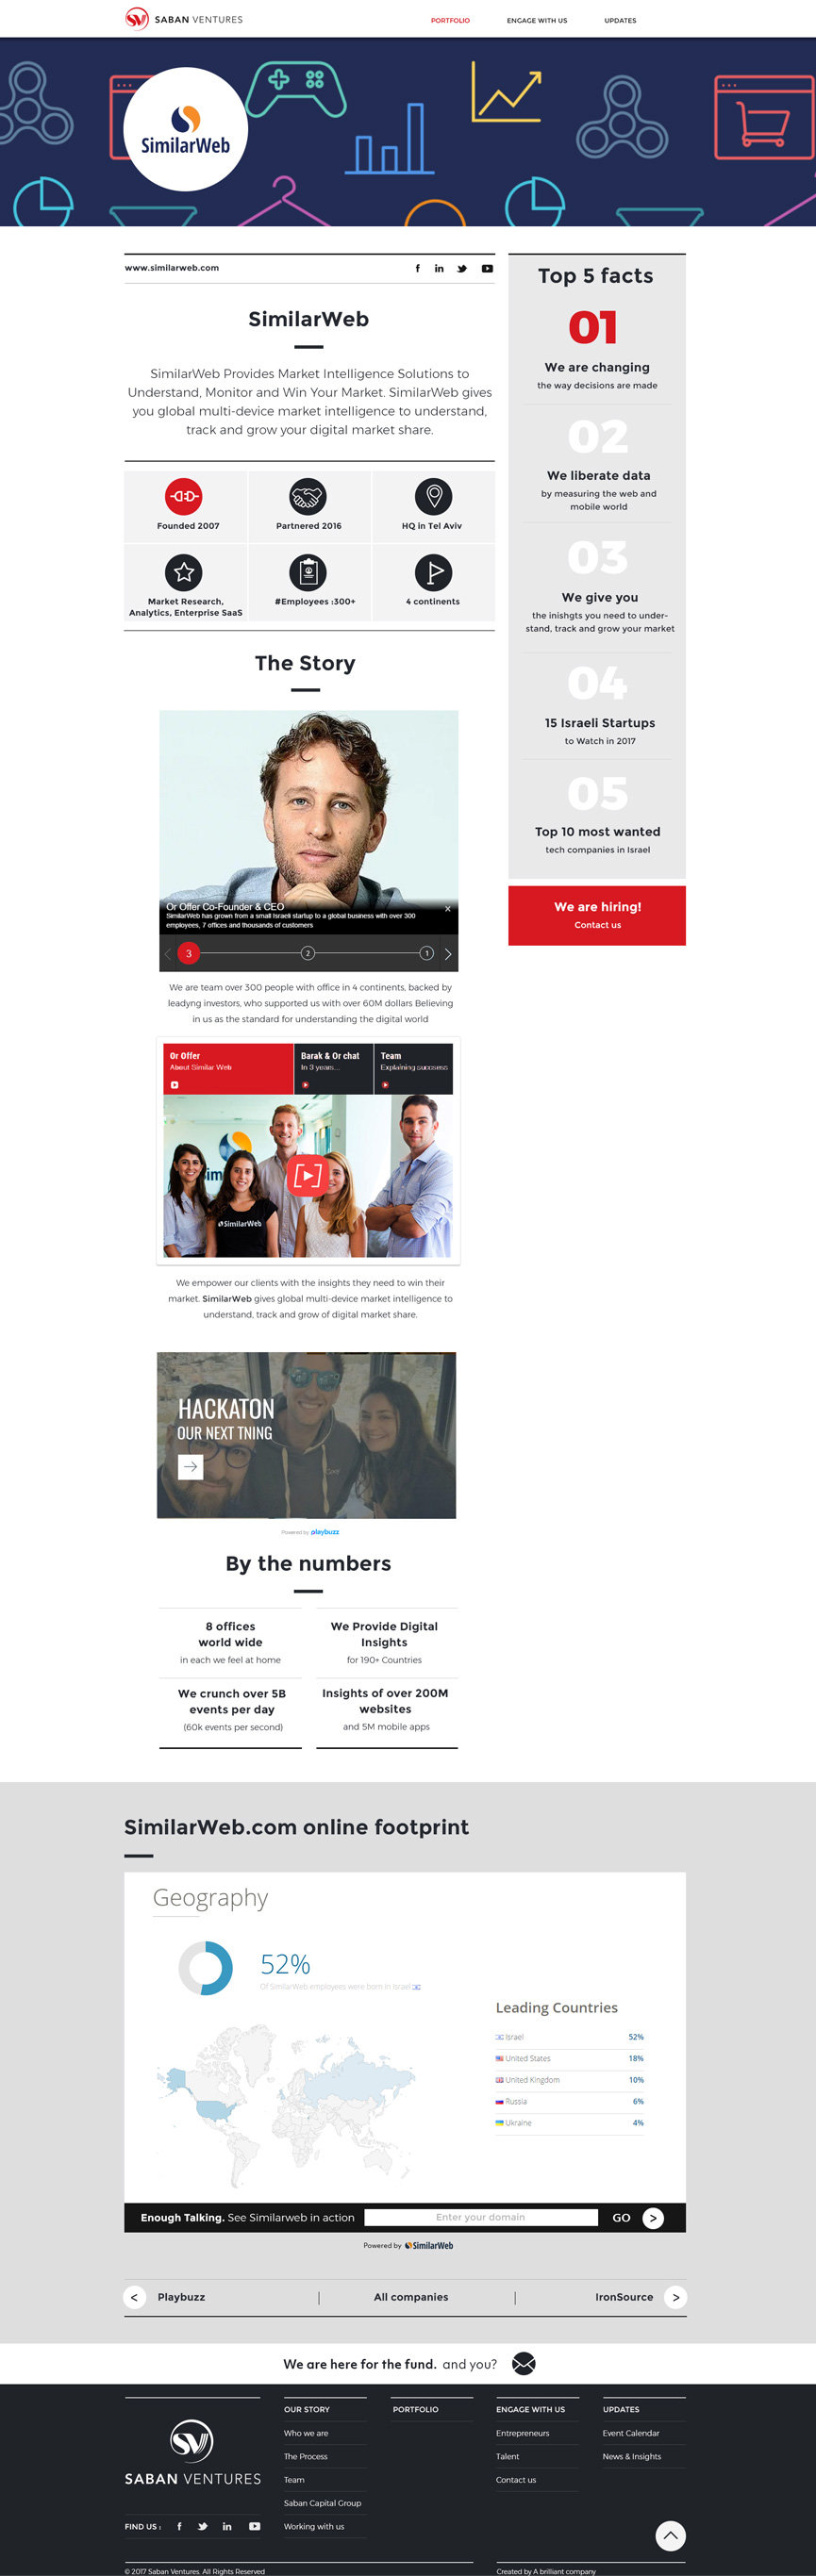 Saban ventures company's page similar web